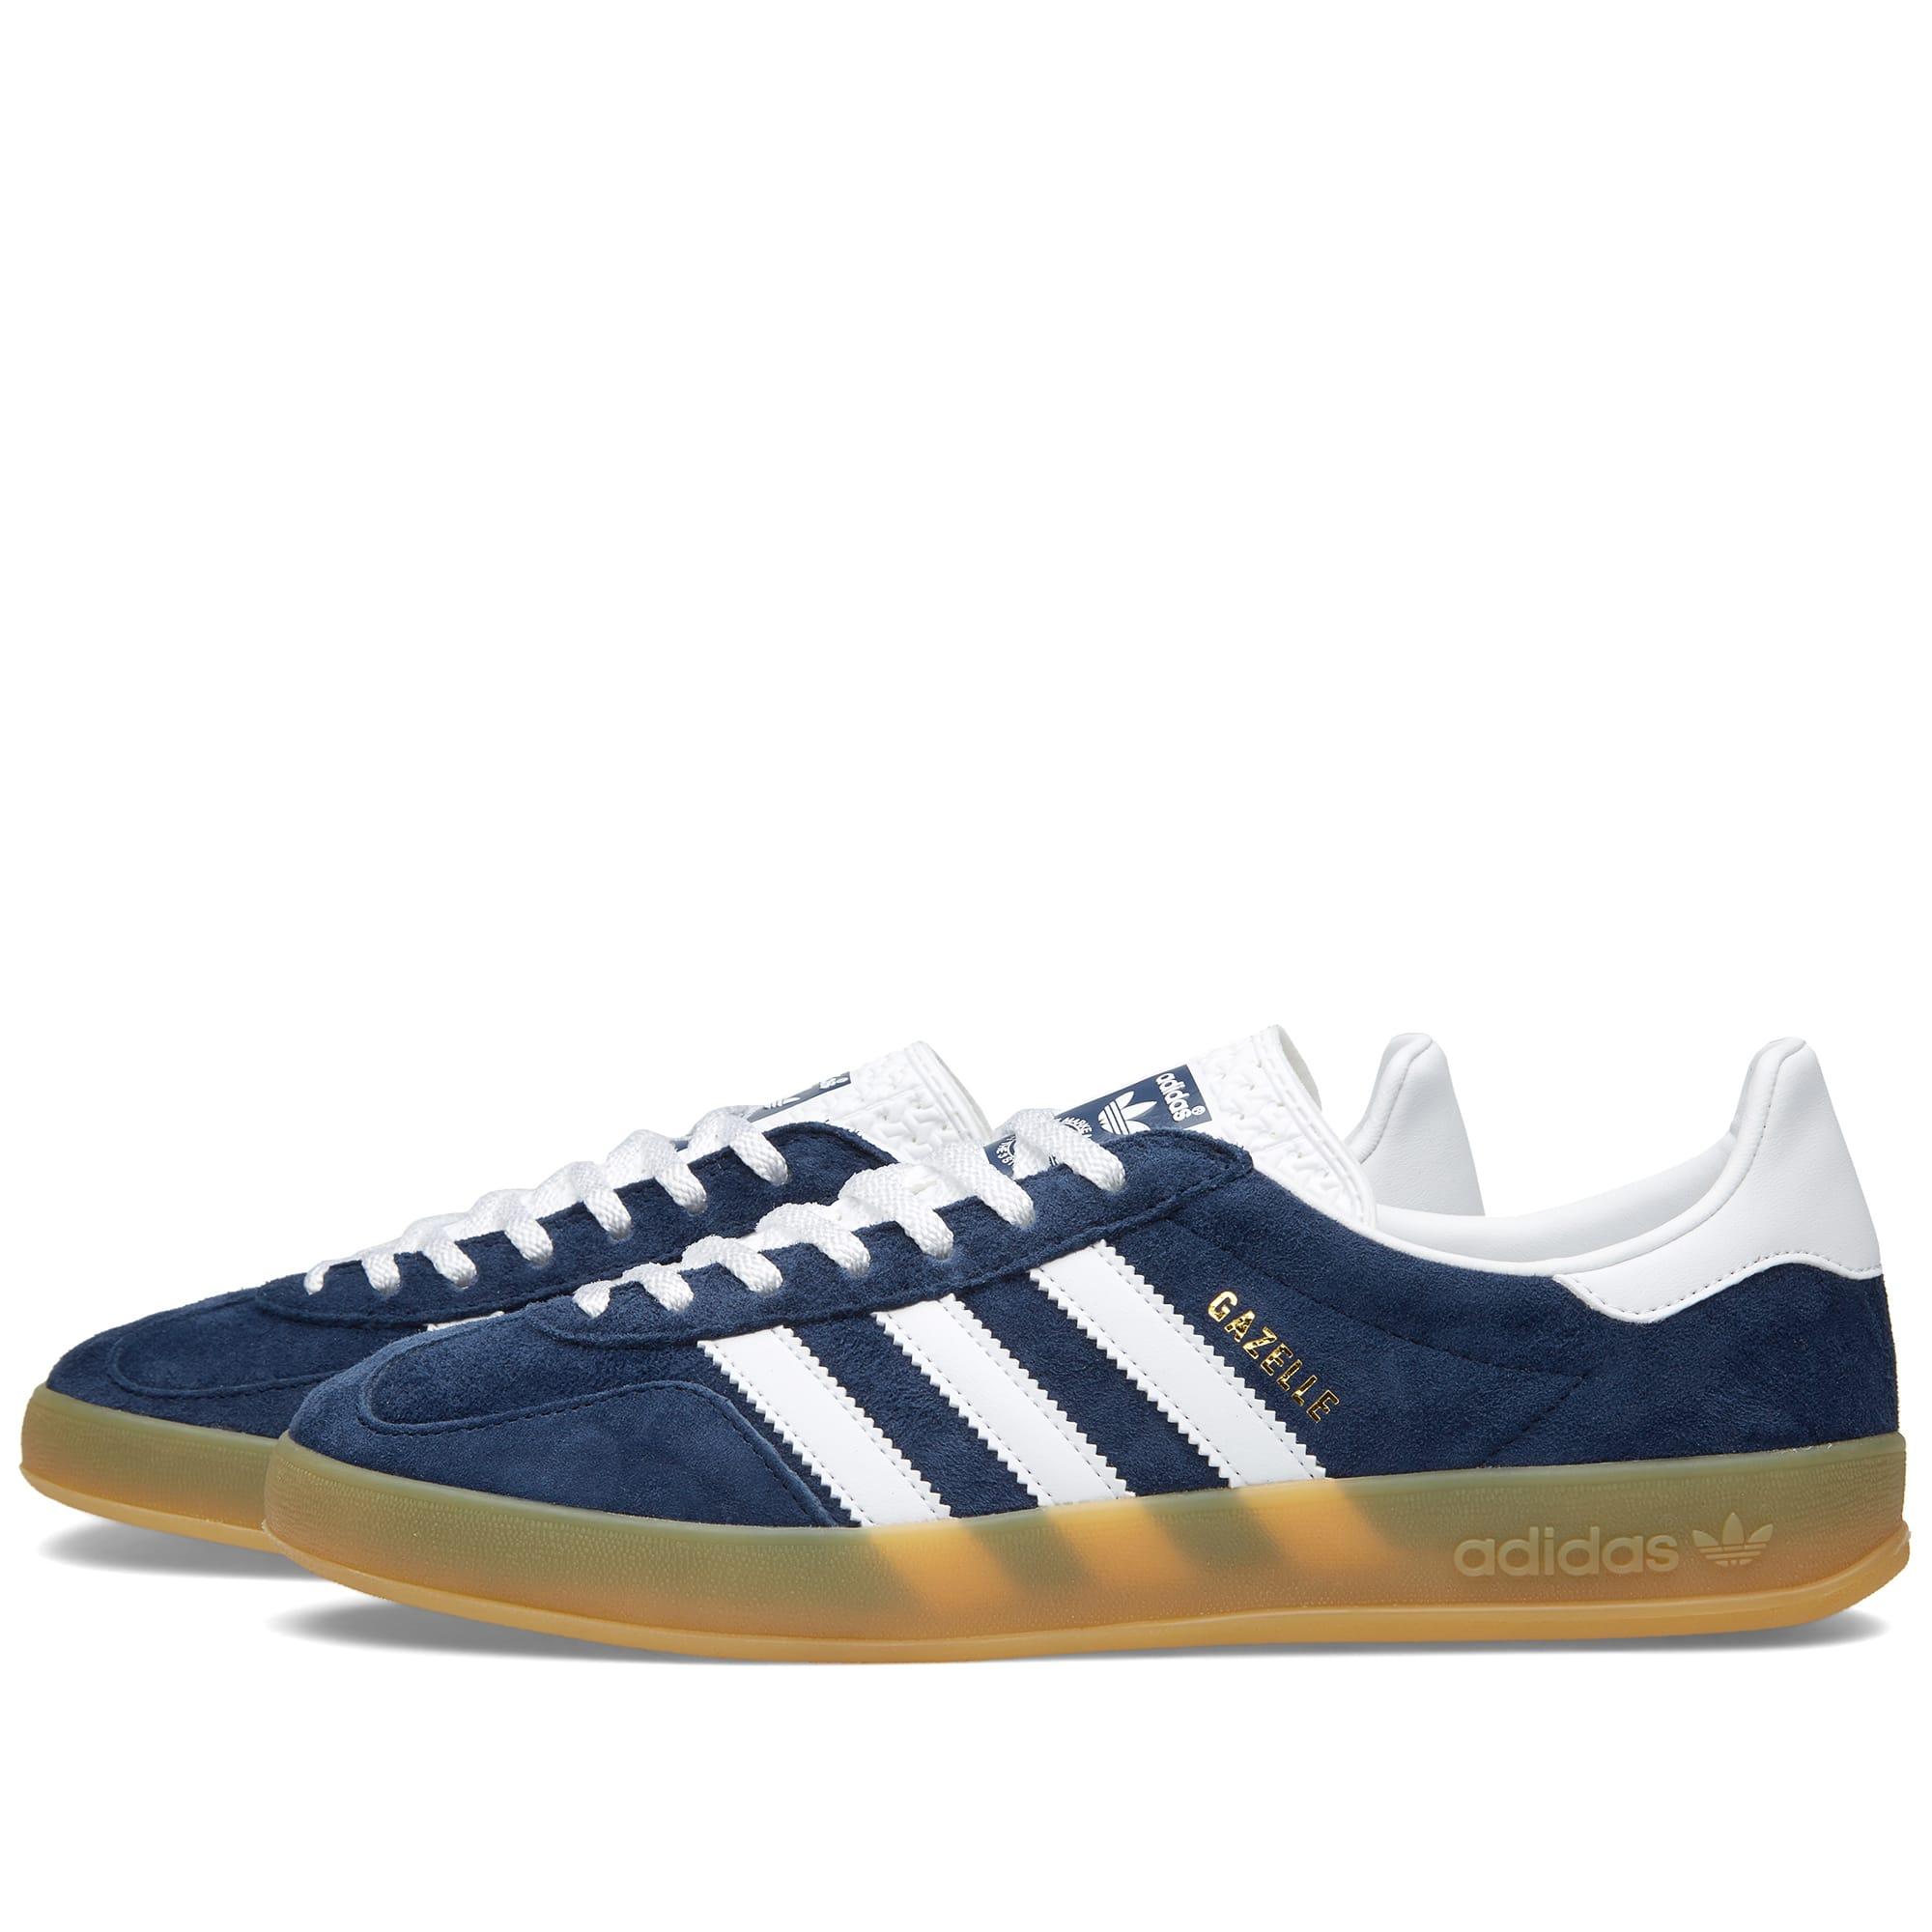 best loved 9429b 92217 adidas gazelle singapore